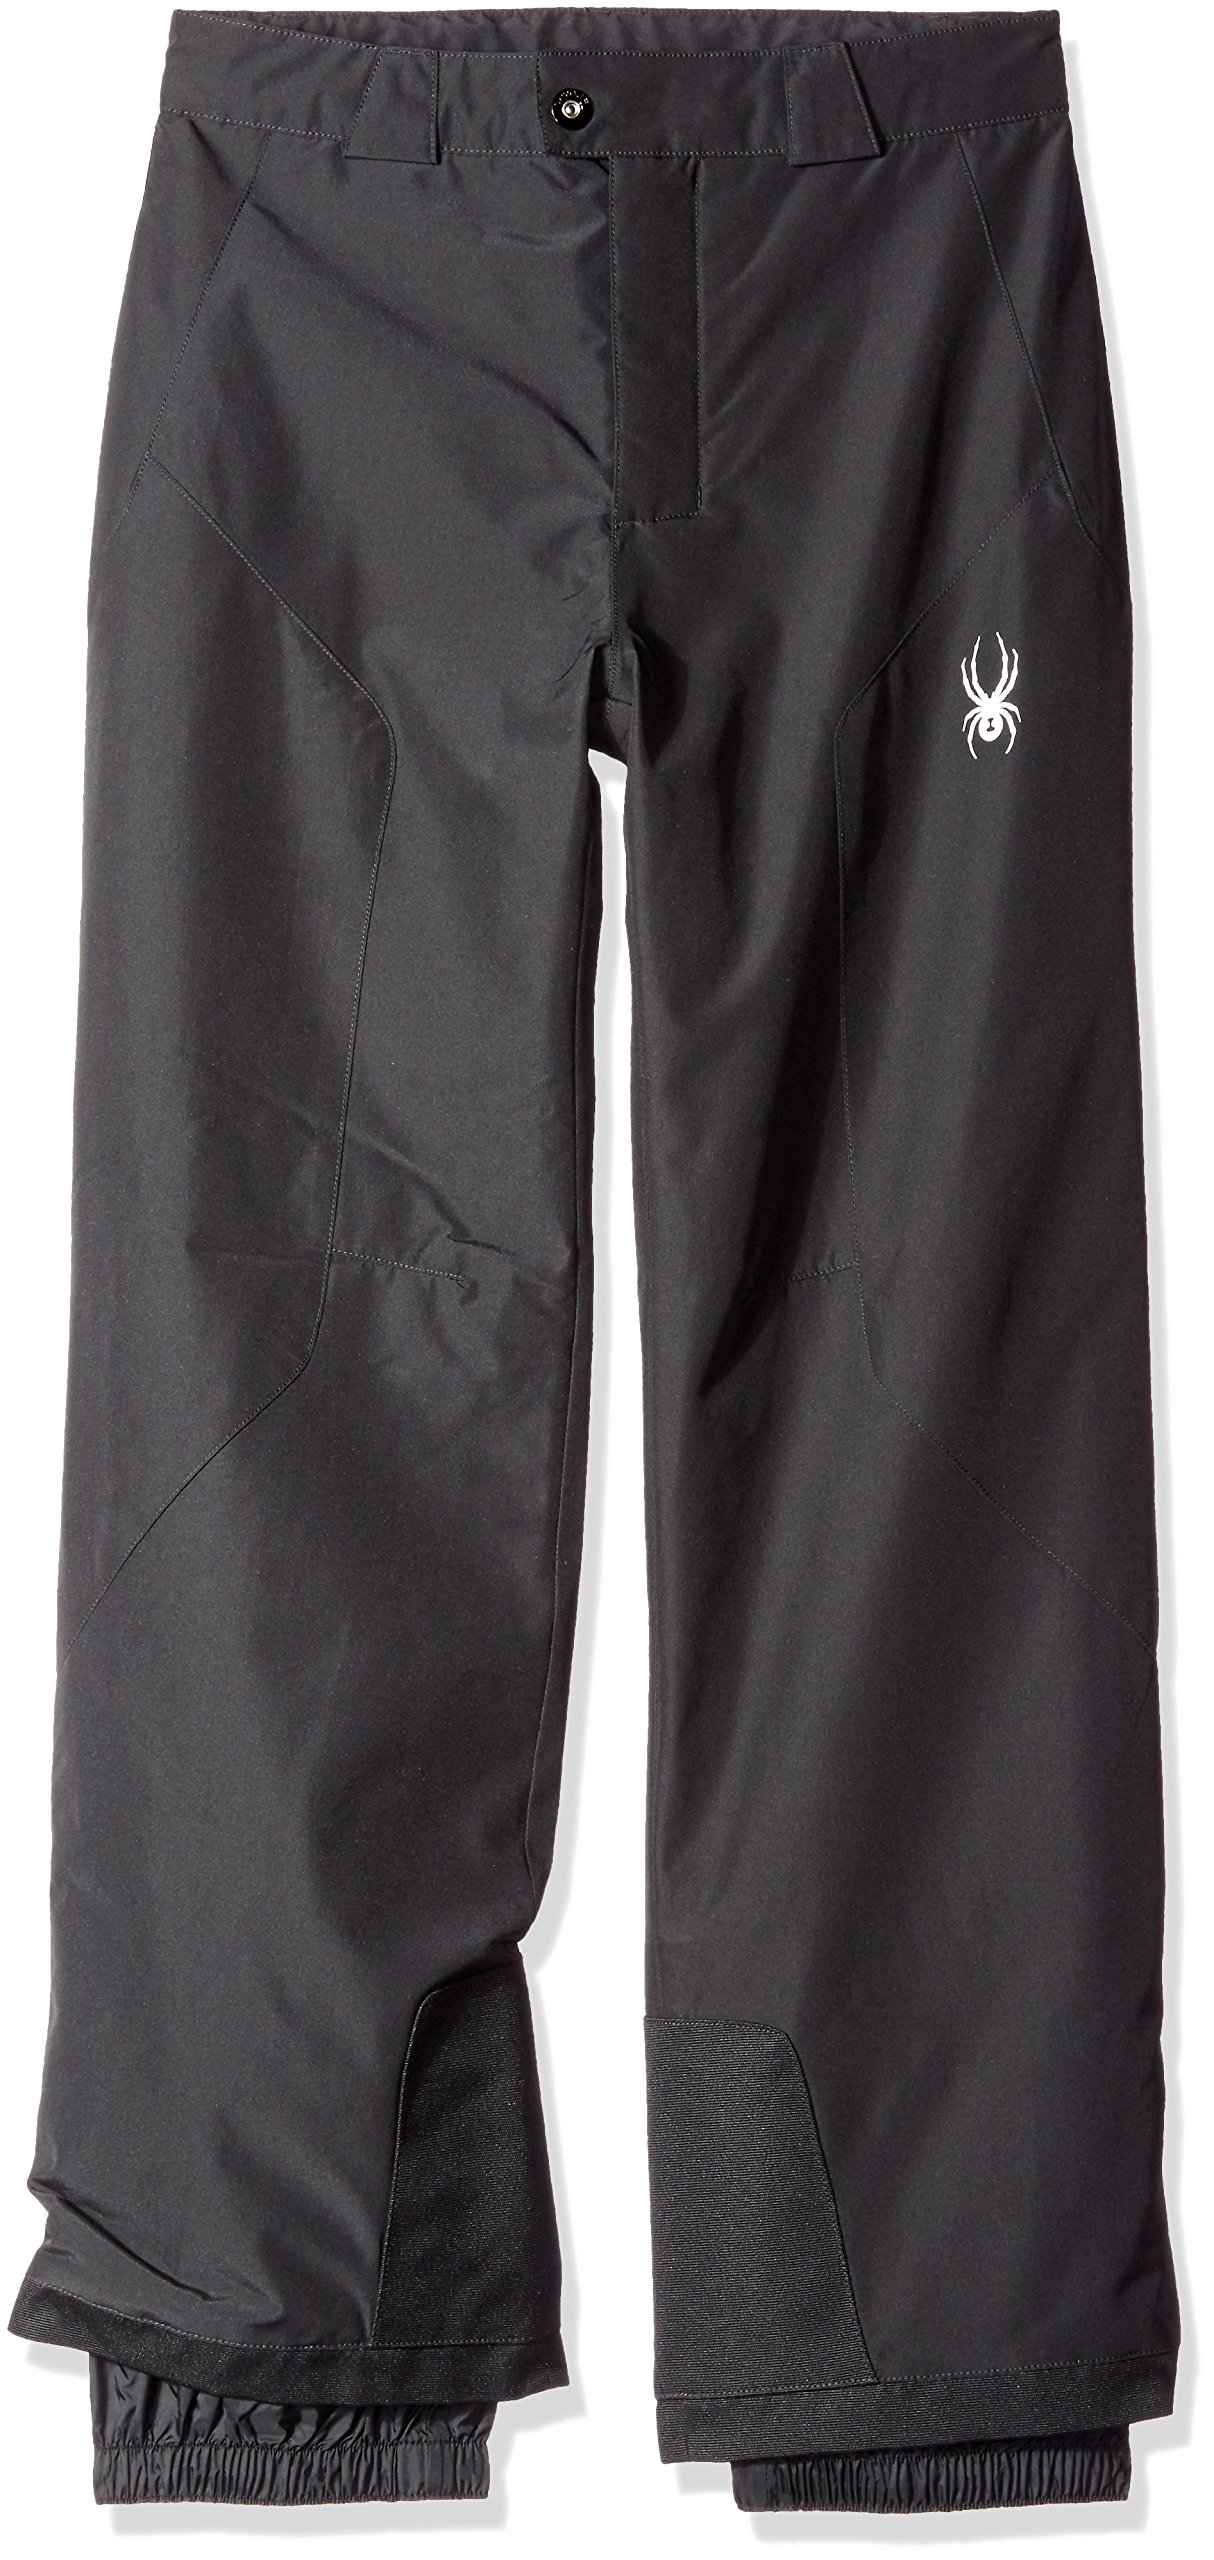 Spyder Boys Siege Pants, Small, Black